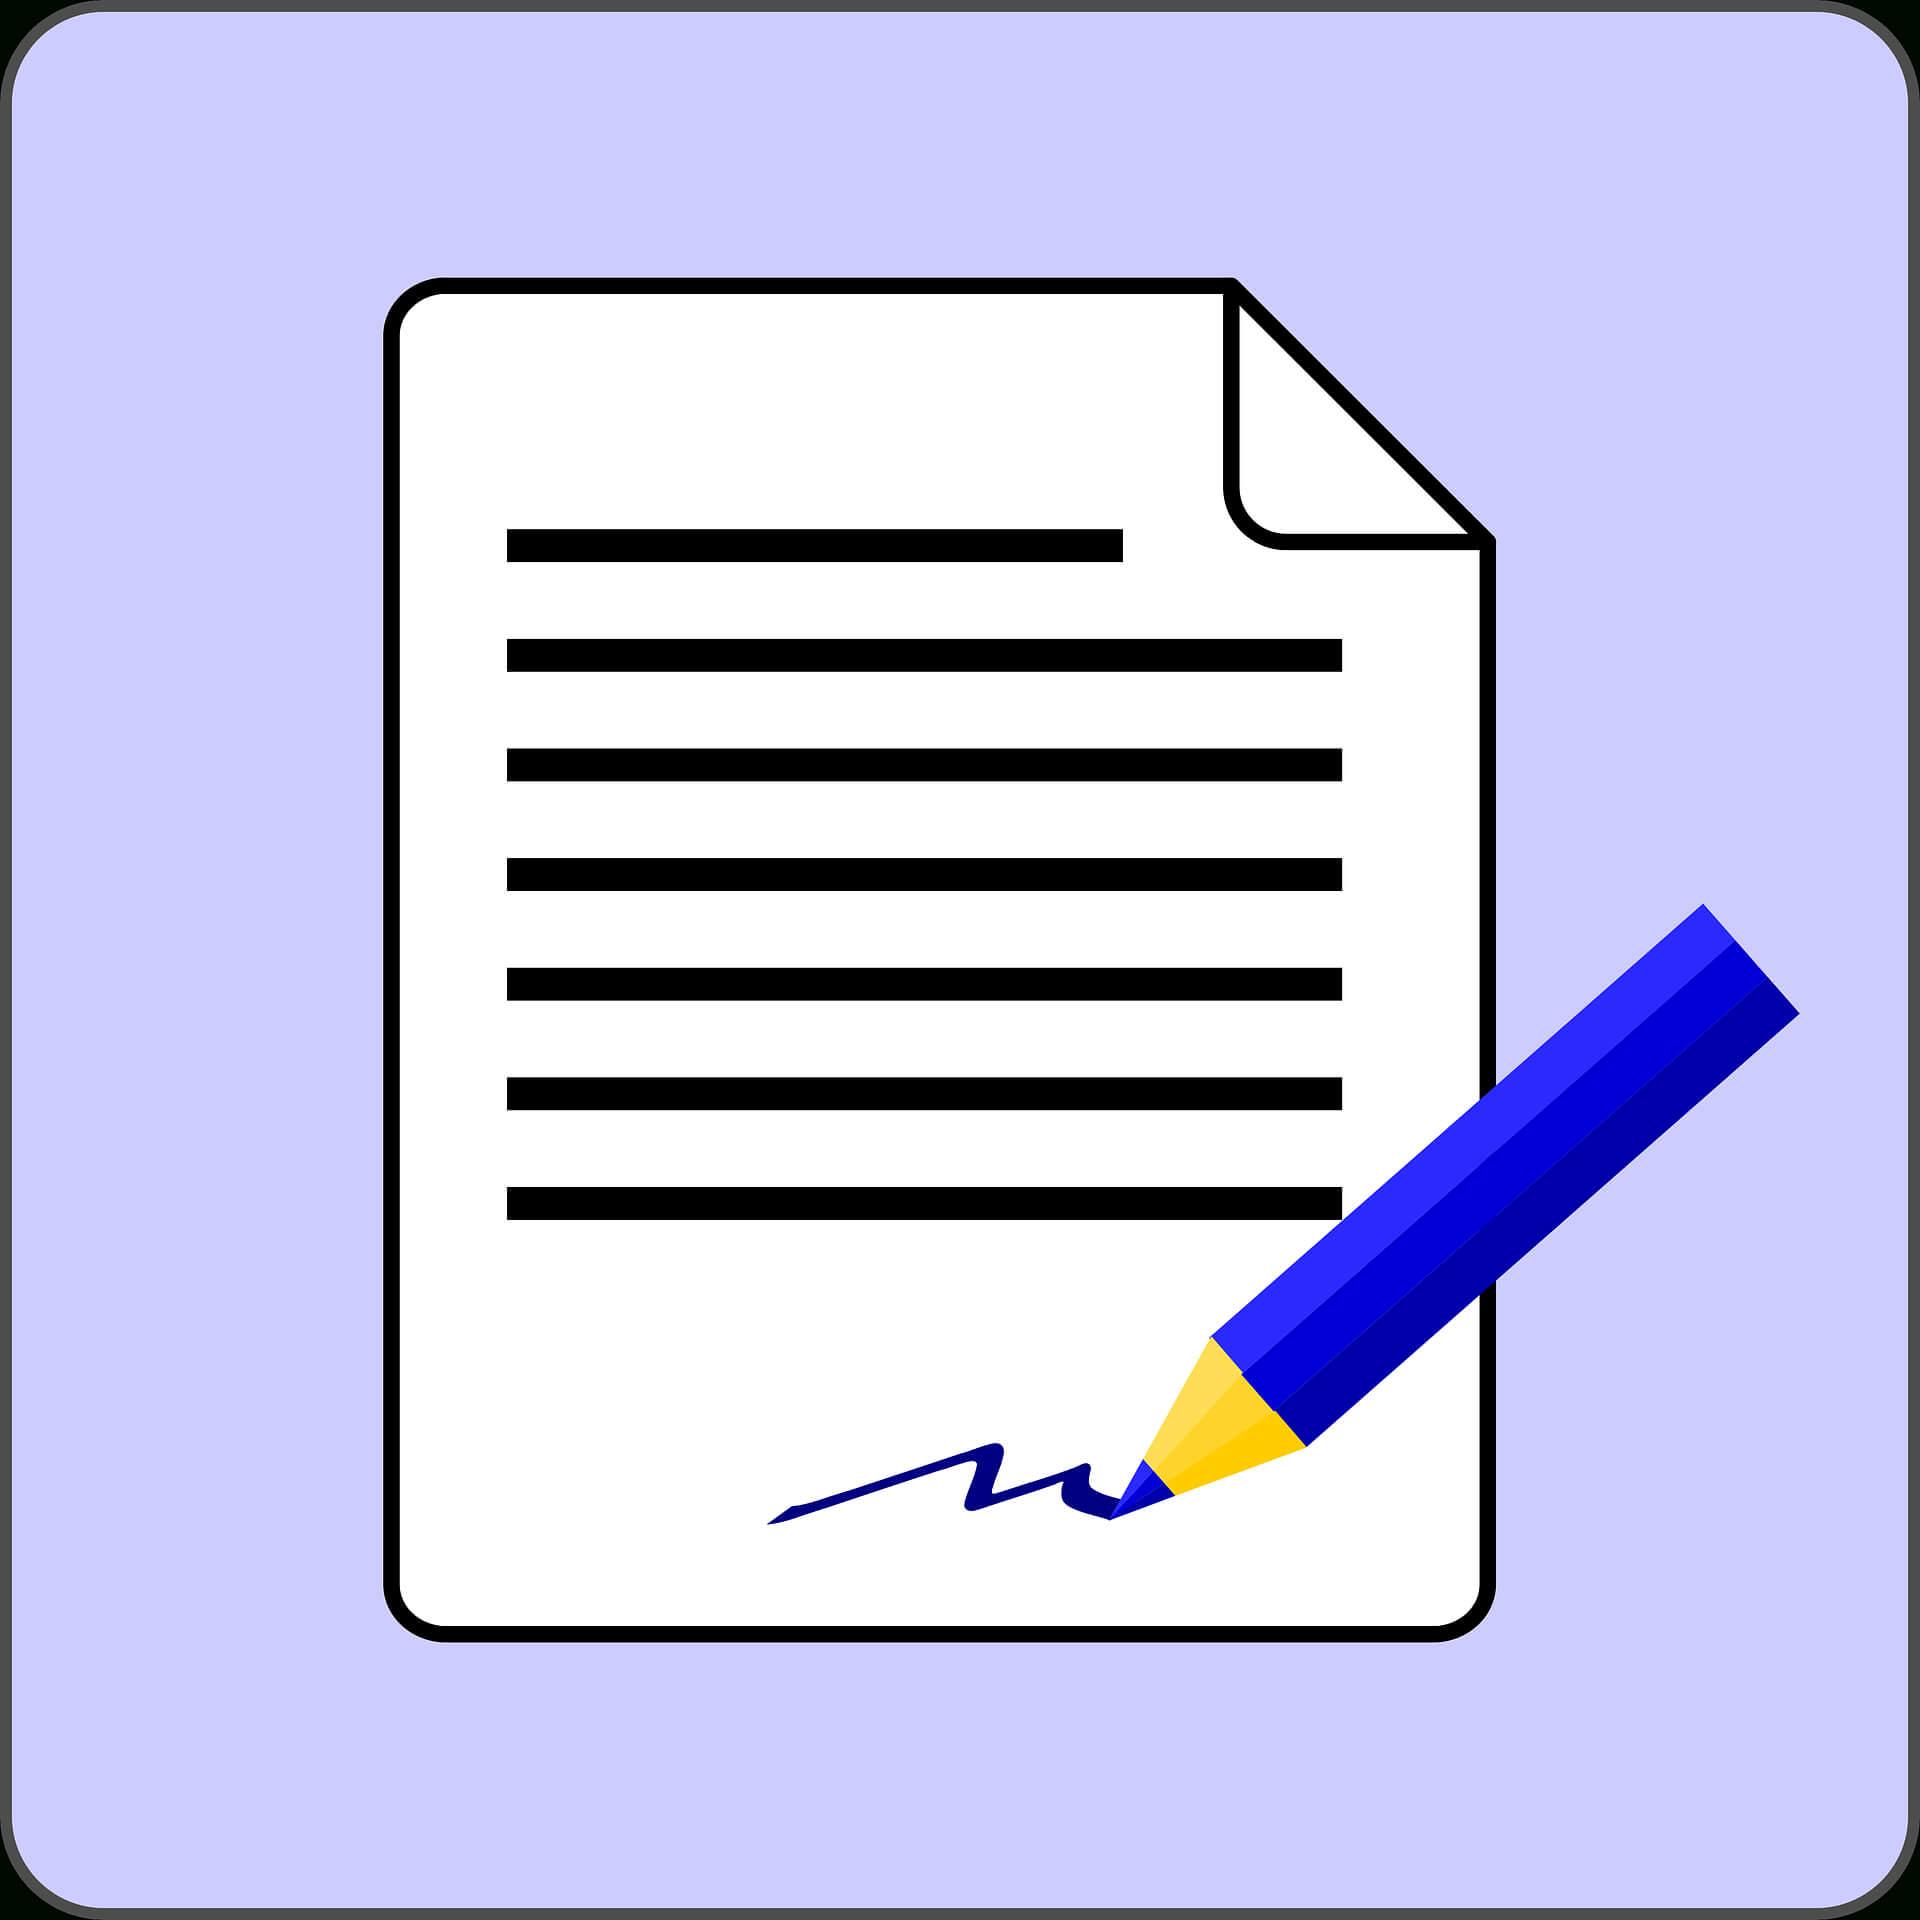 Free Share Certificate Template Regarding Share Certificate Template Companies House